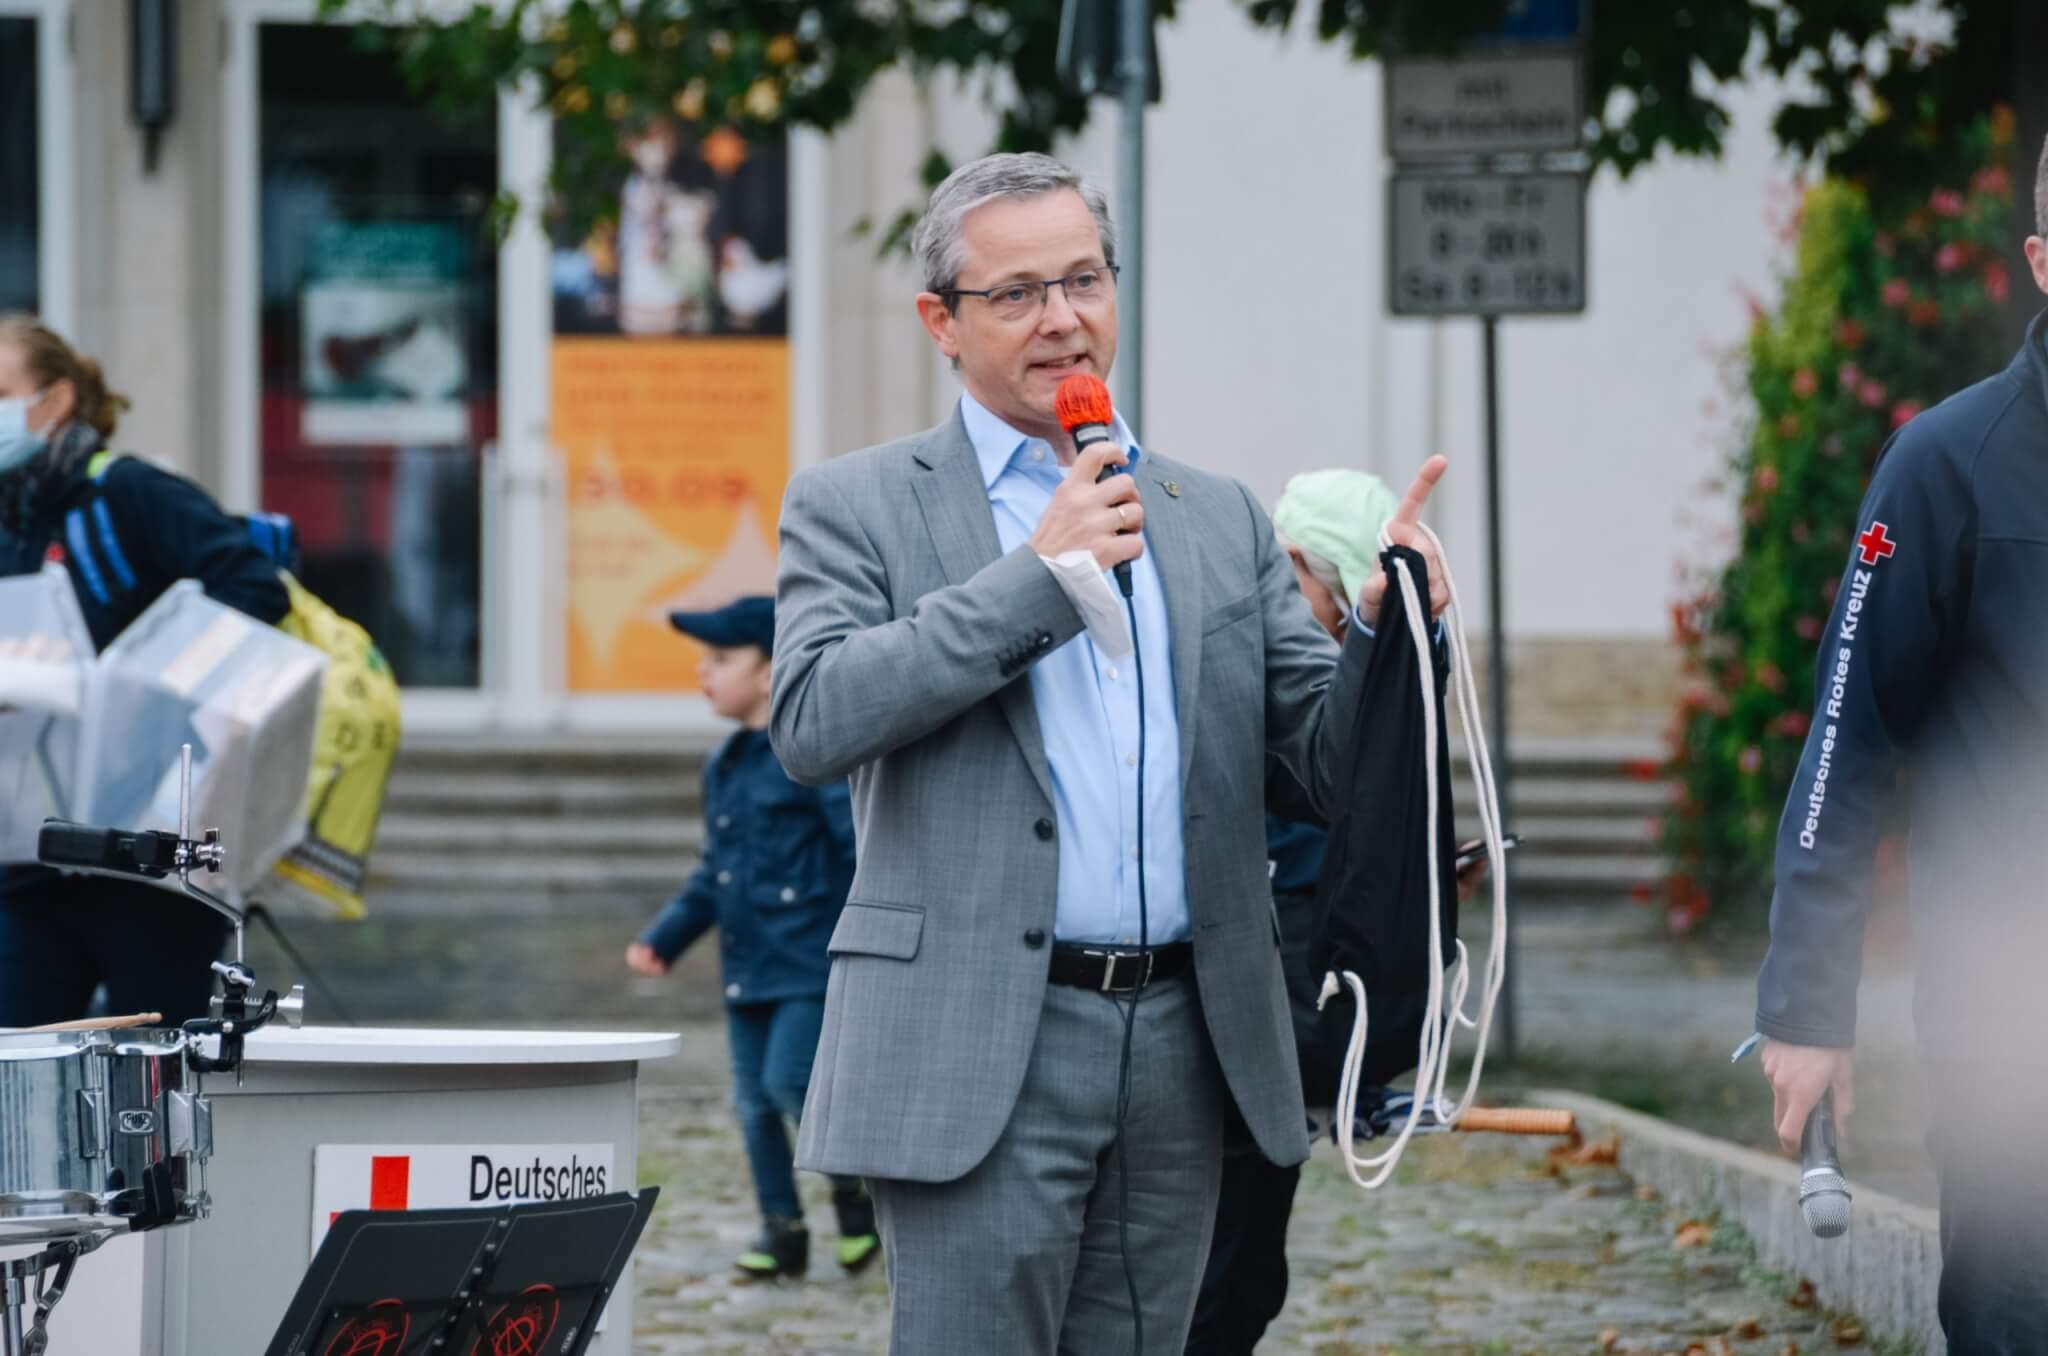 Bürgermeister Igel